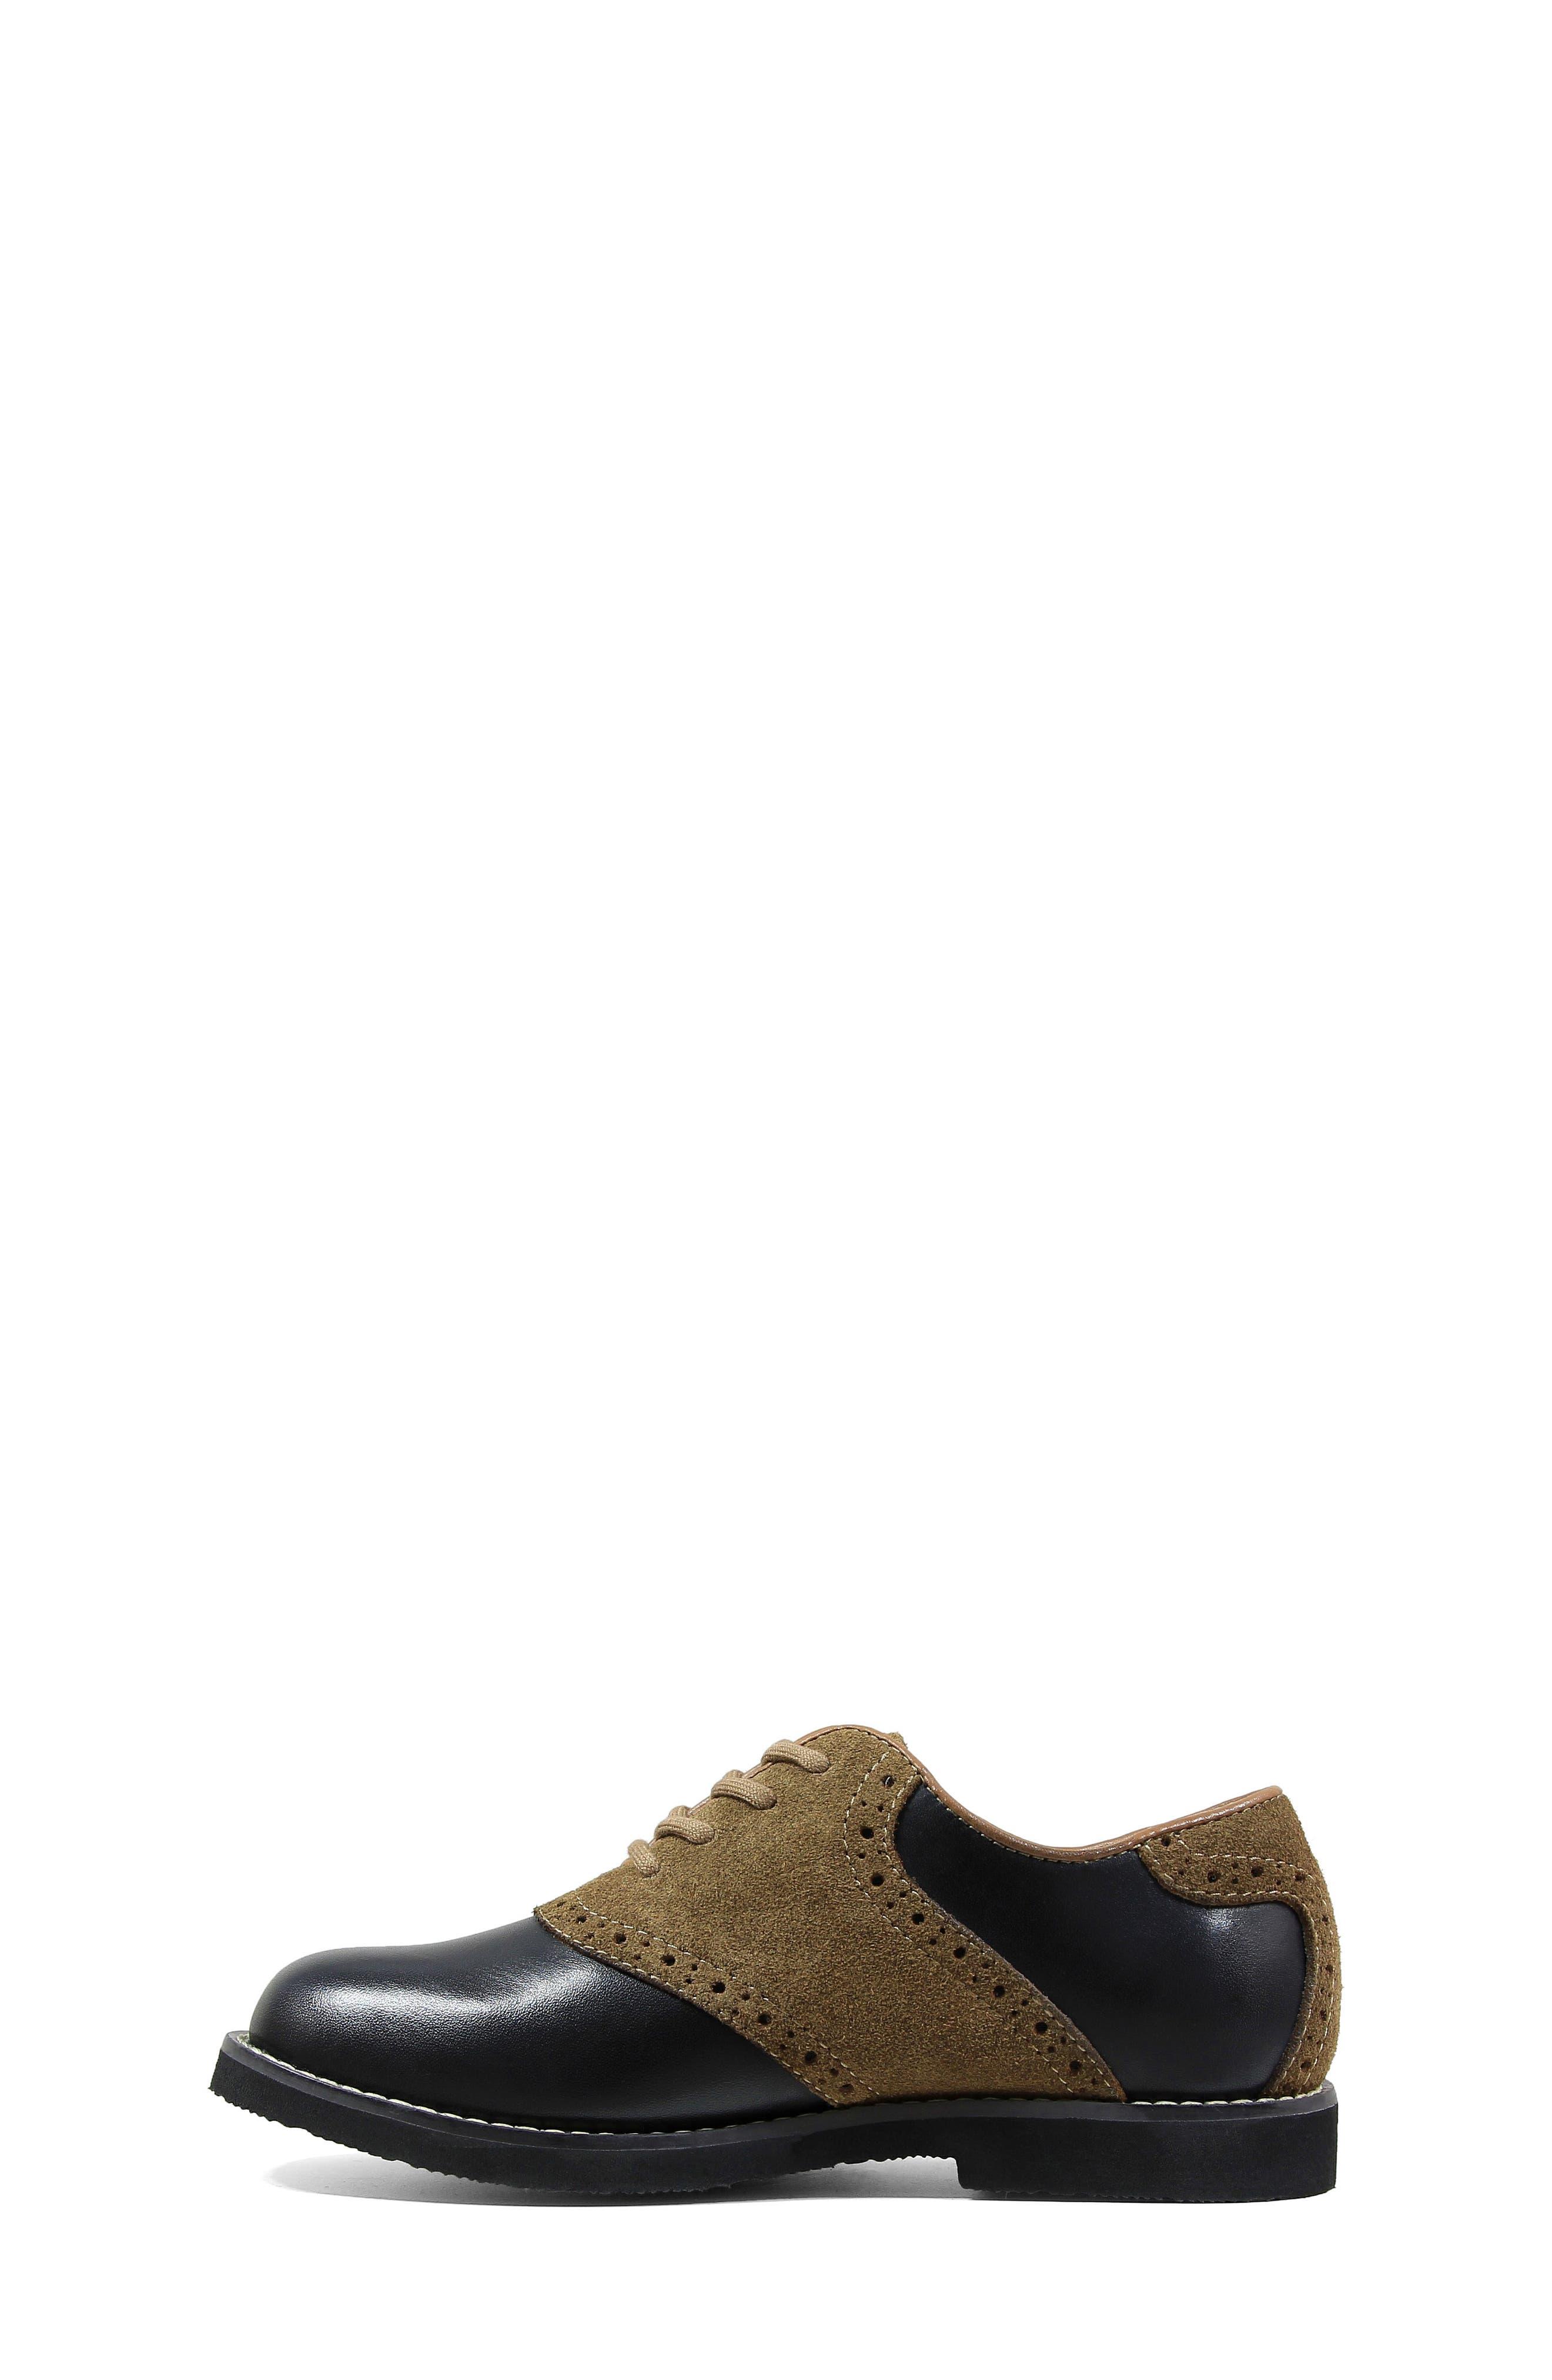 FLORSHEIM, 'Kennett Jr. II' Saddle Shoe, Alternate thumbnail 2, color, SMOOTH BLACK W/ MOCHA SUEDE